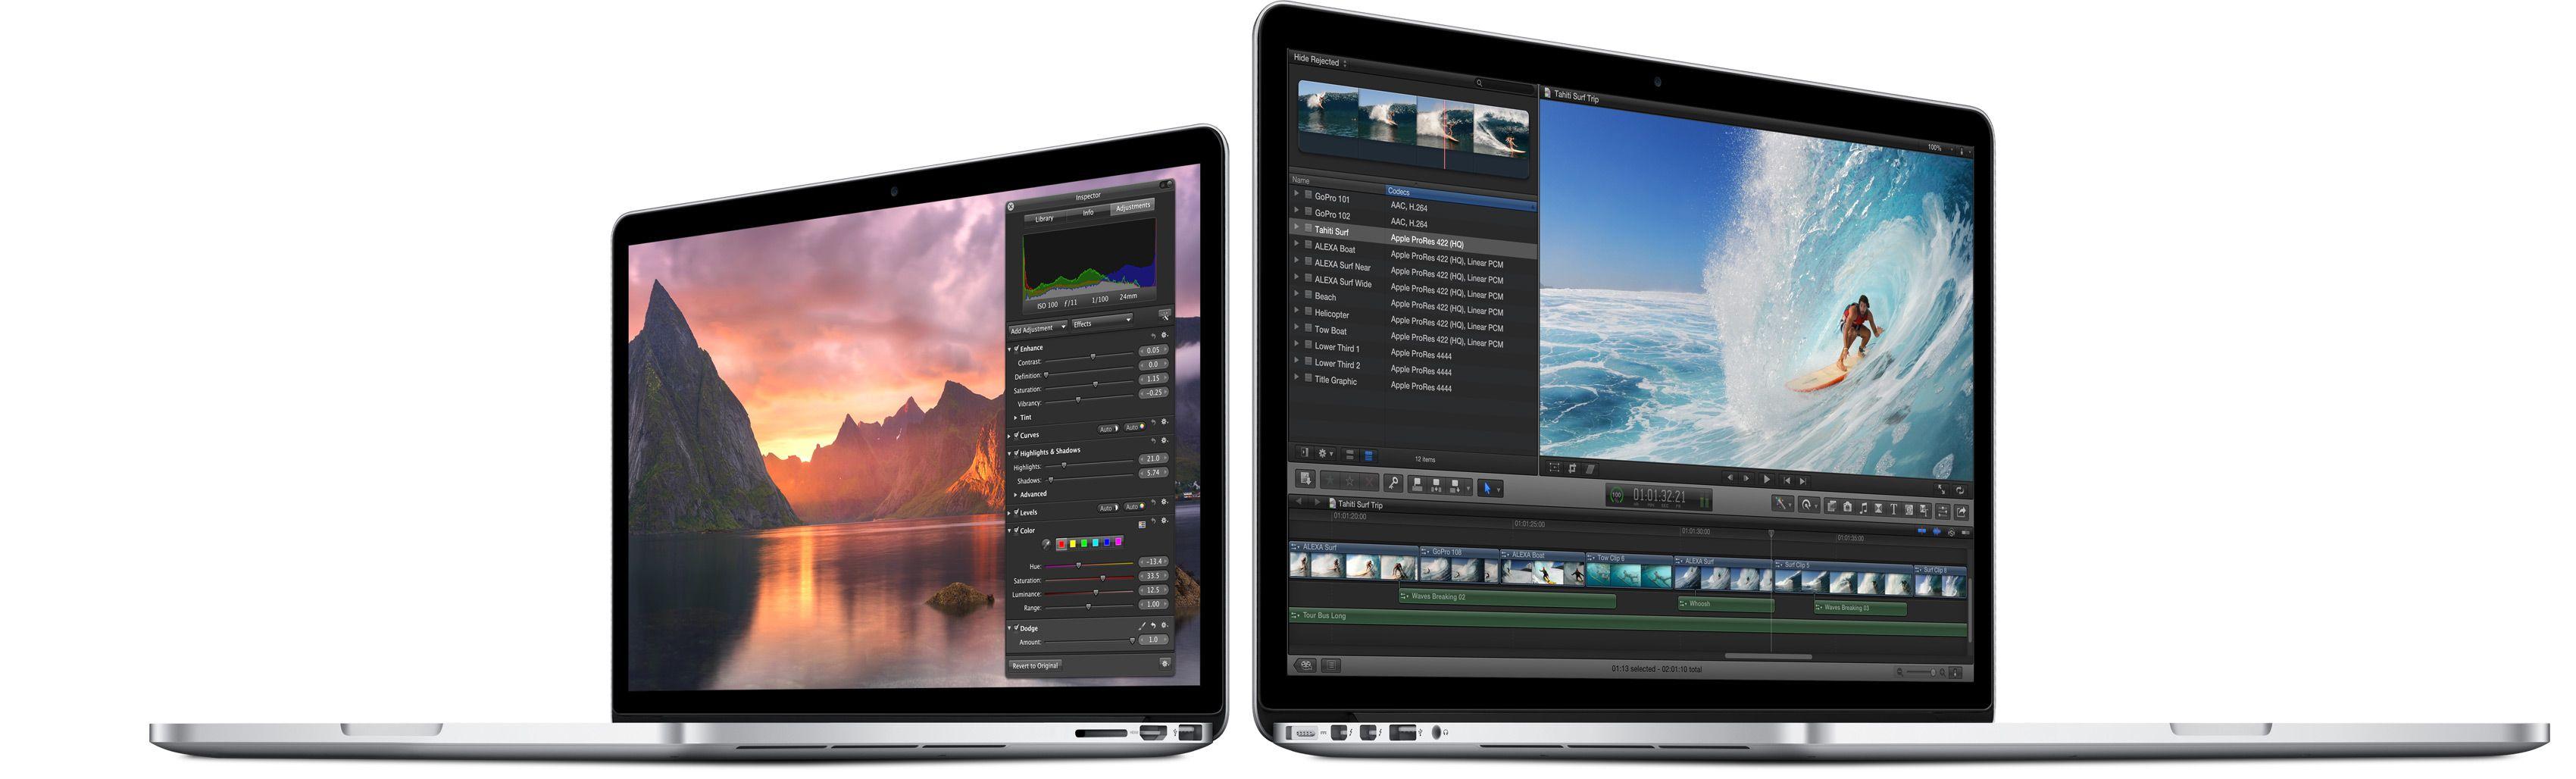 "Apple MacBook Pro 13"" 256GB 8GB RAM I5 Macbook pro"